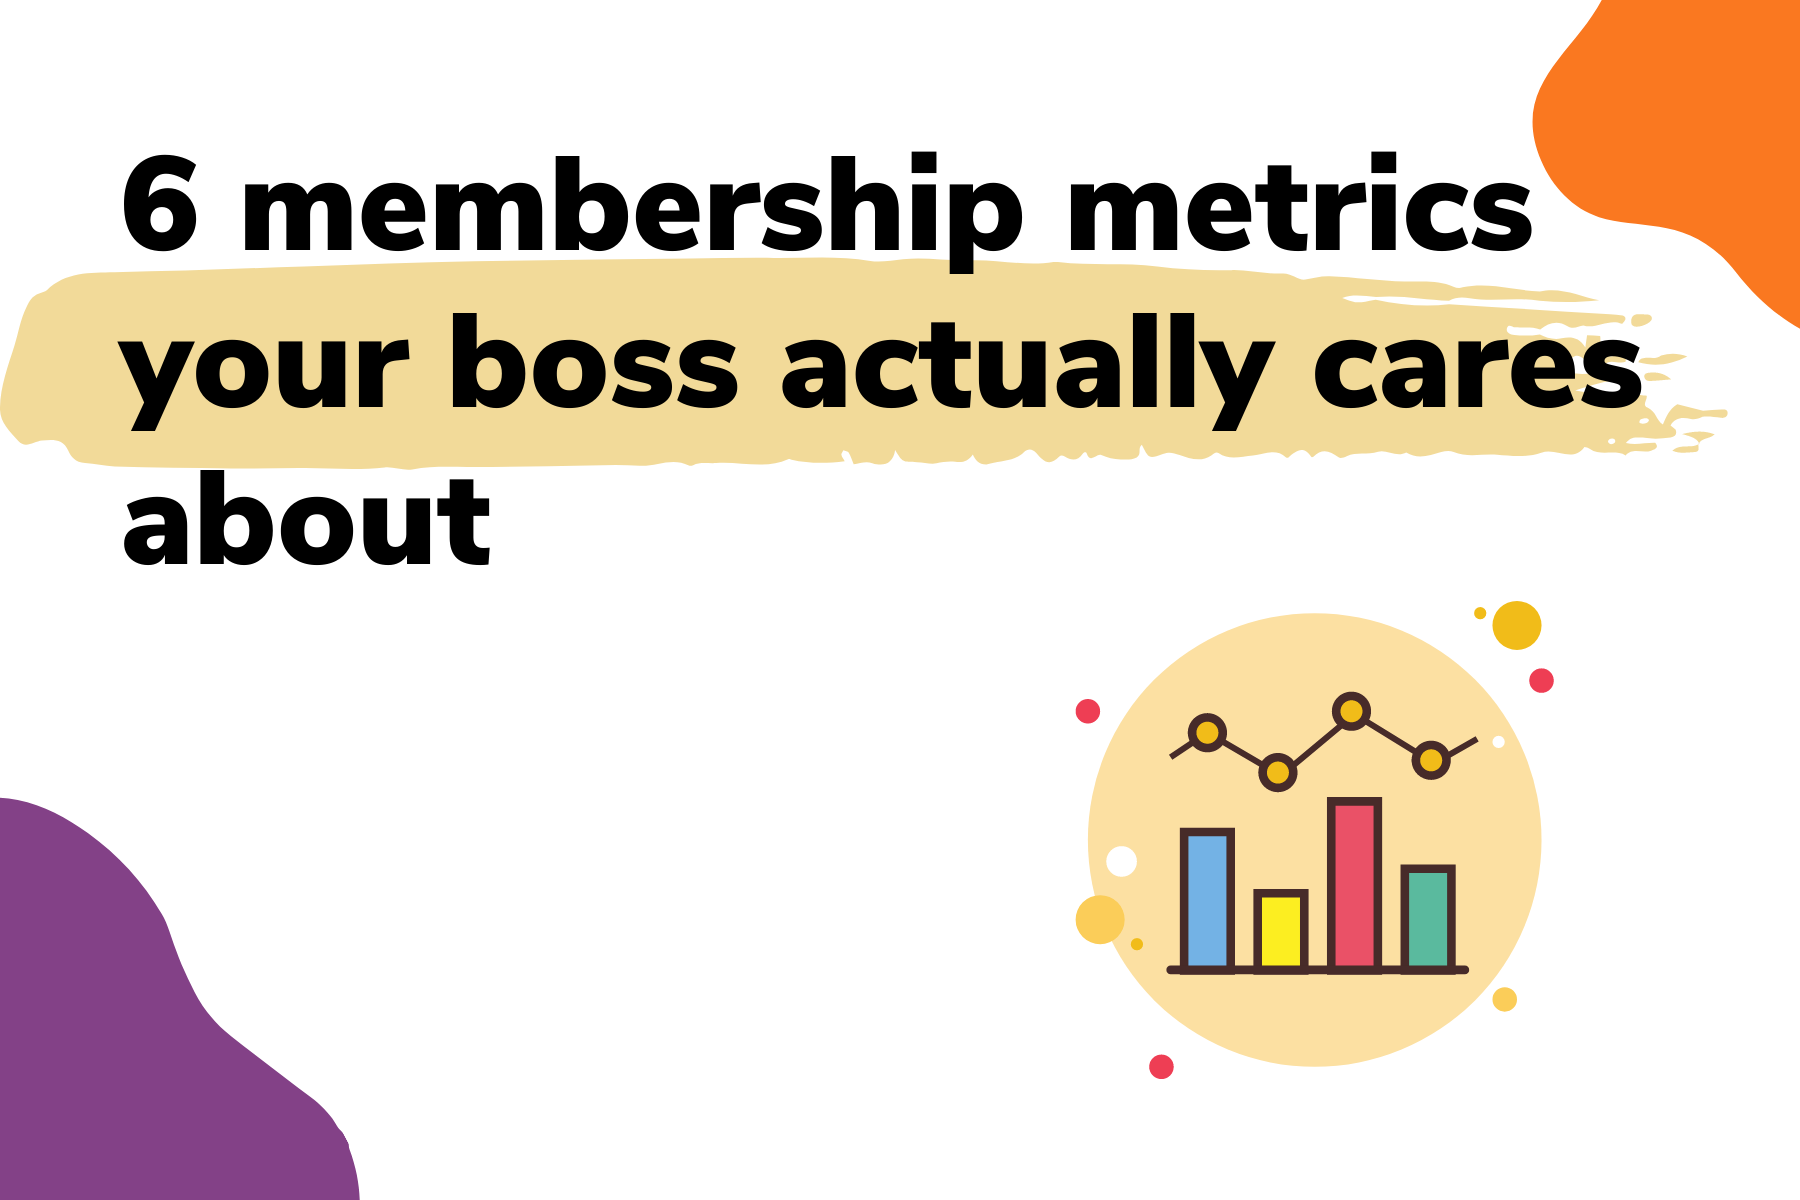 6 membership metrics your boss actually cares about